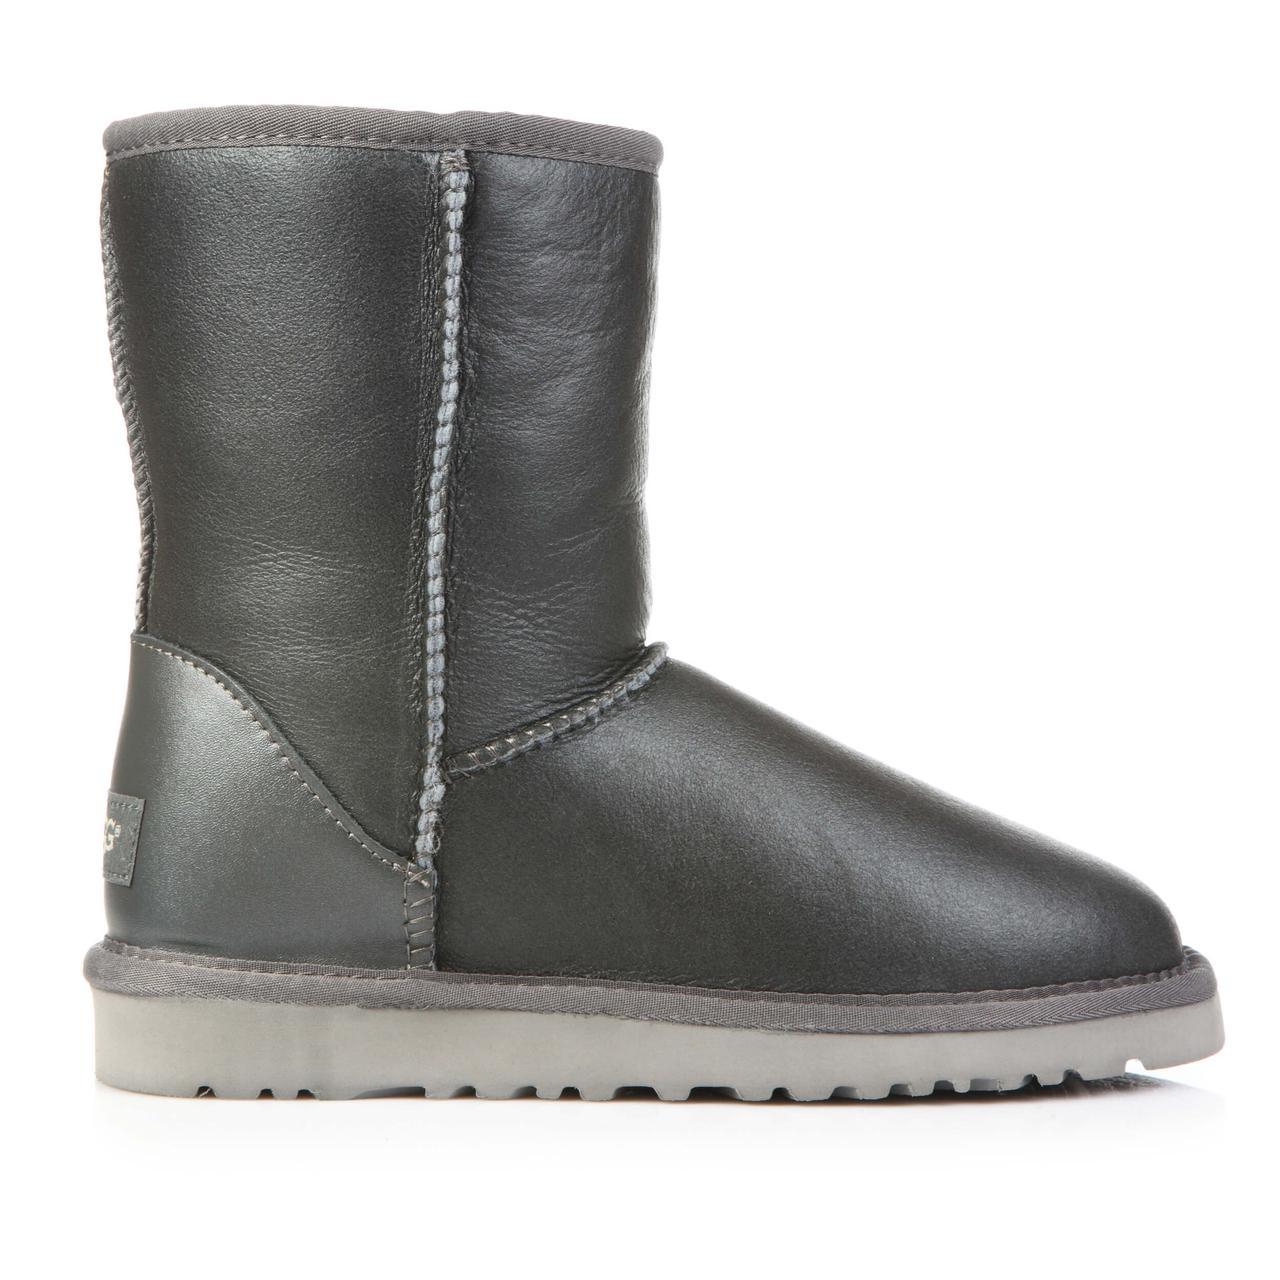 Уггі UGG Australaia Classic Short Grey Leather